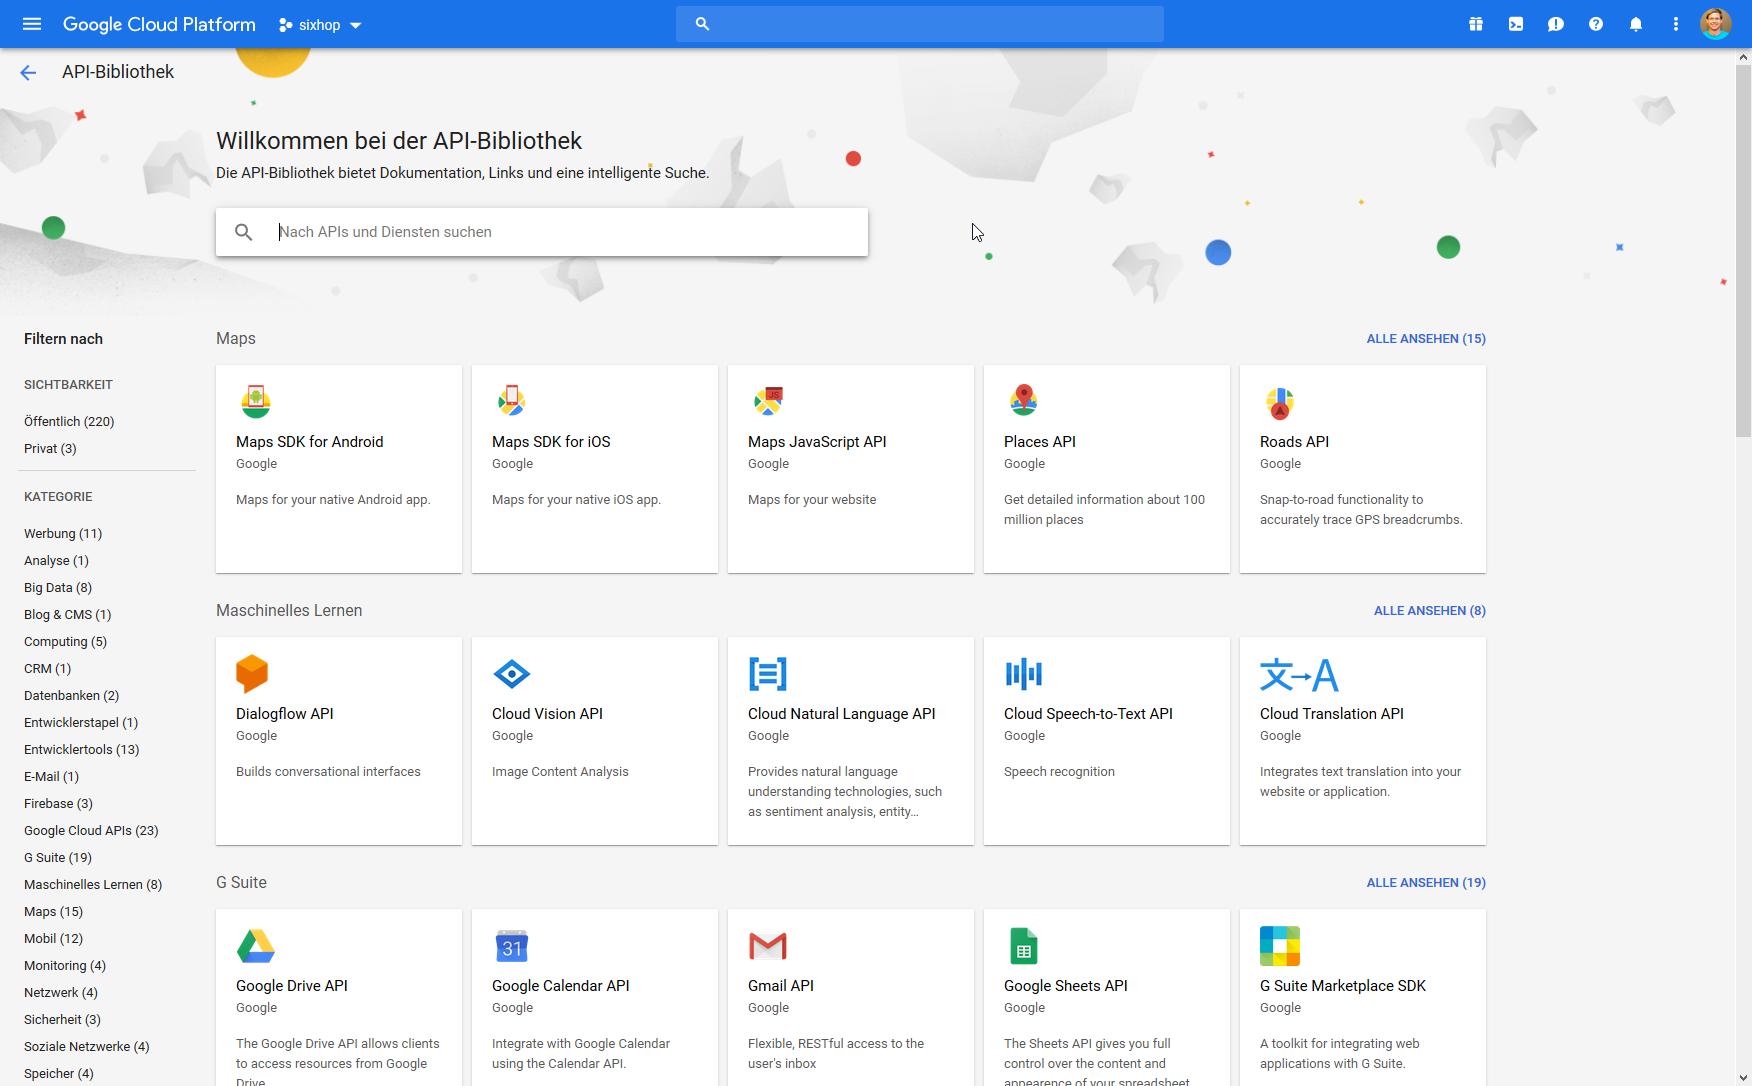 Maps JavaScript API auswählen